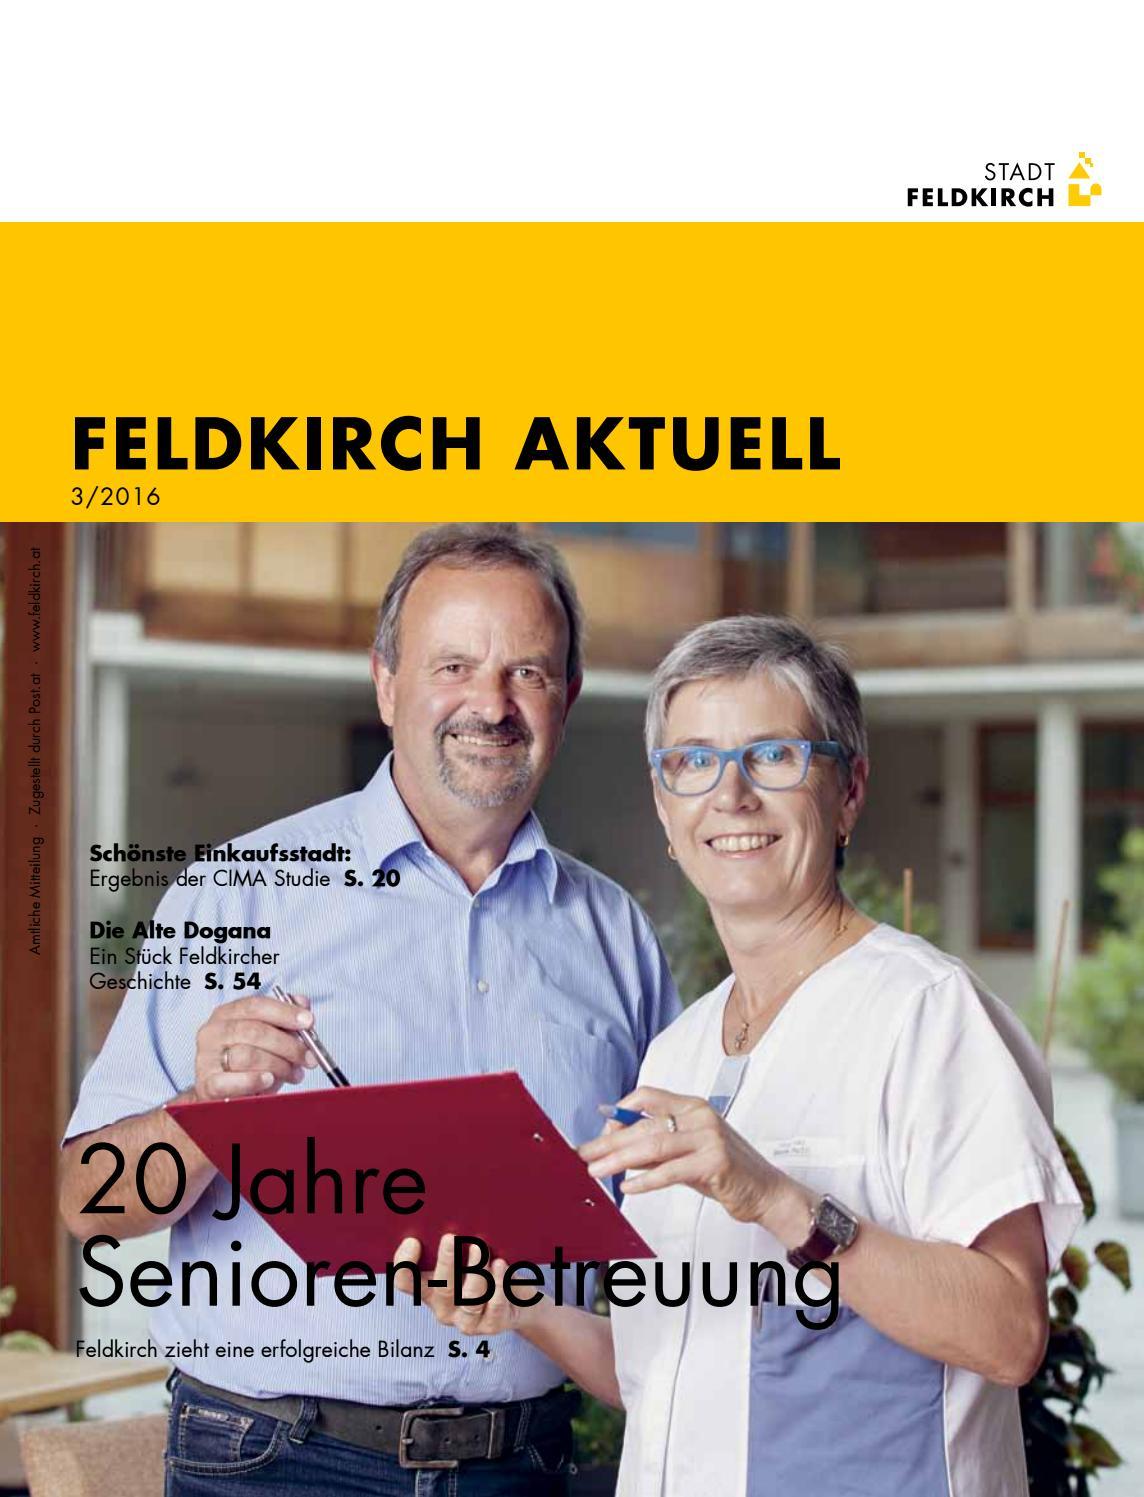 Feldkirch frauen kennenlernen, Gay dating in rohrbach-berg